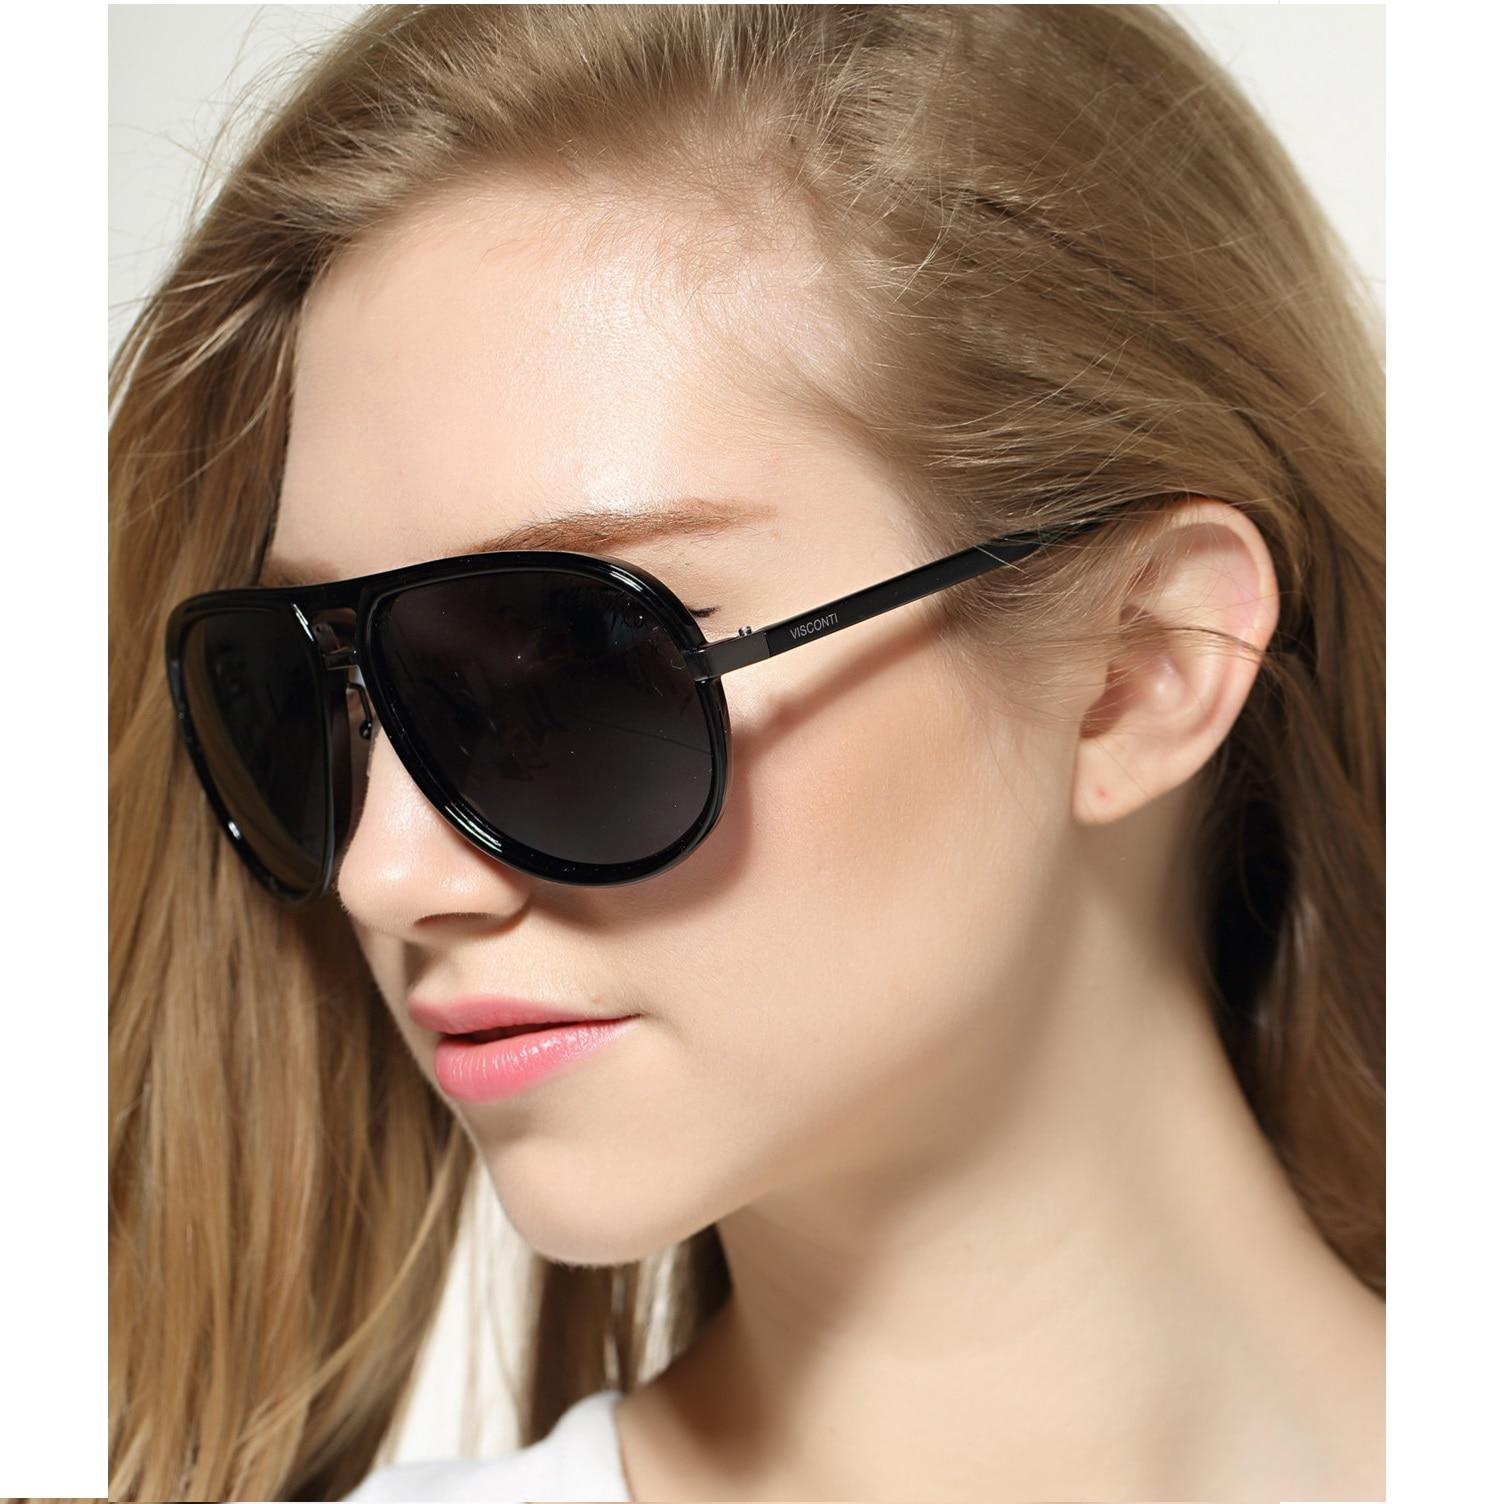 21116419dc3 Mens Large Aviator Sunglasses - Restaurant and Palinka Bar